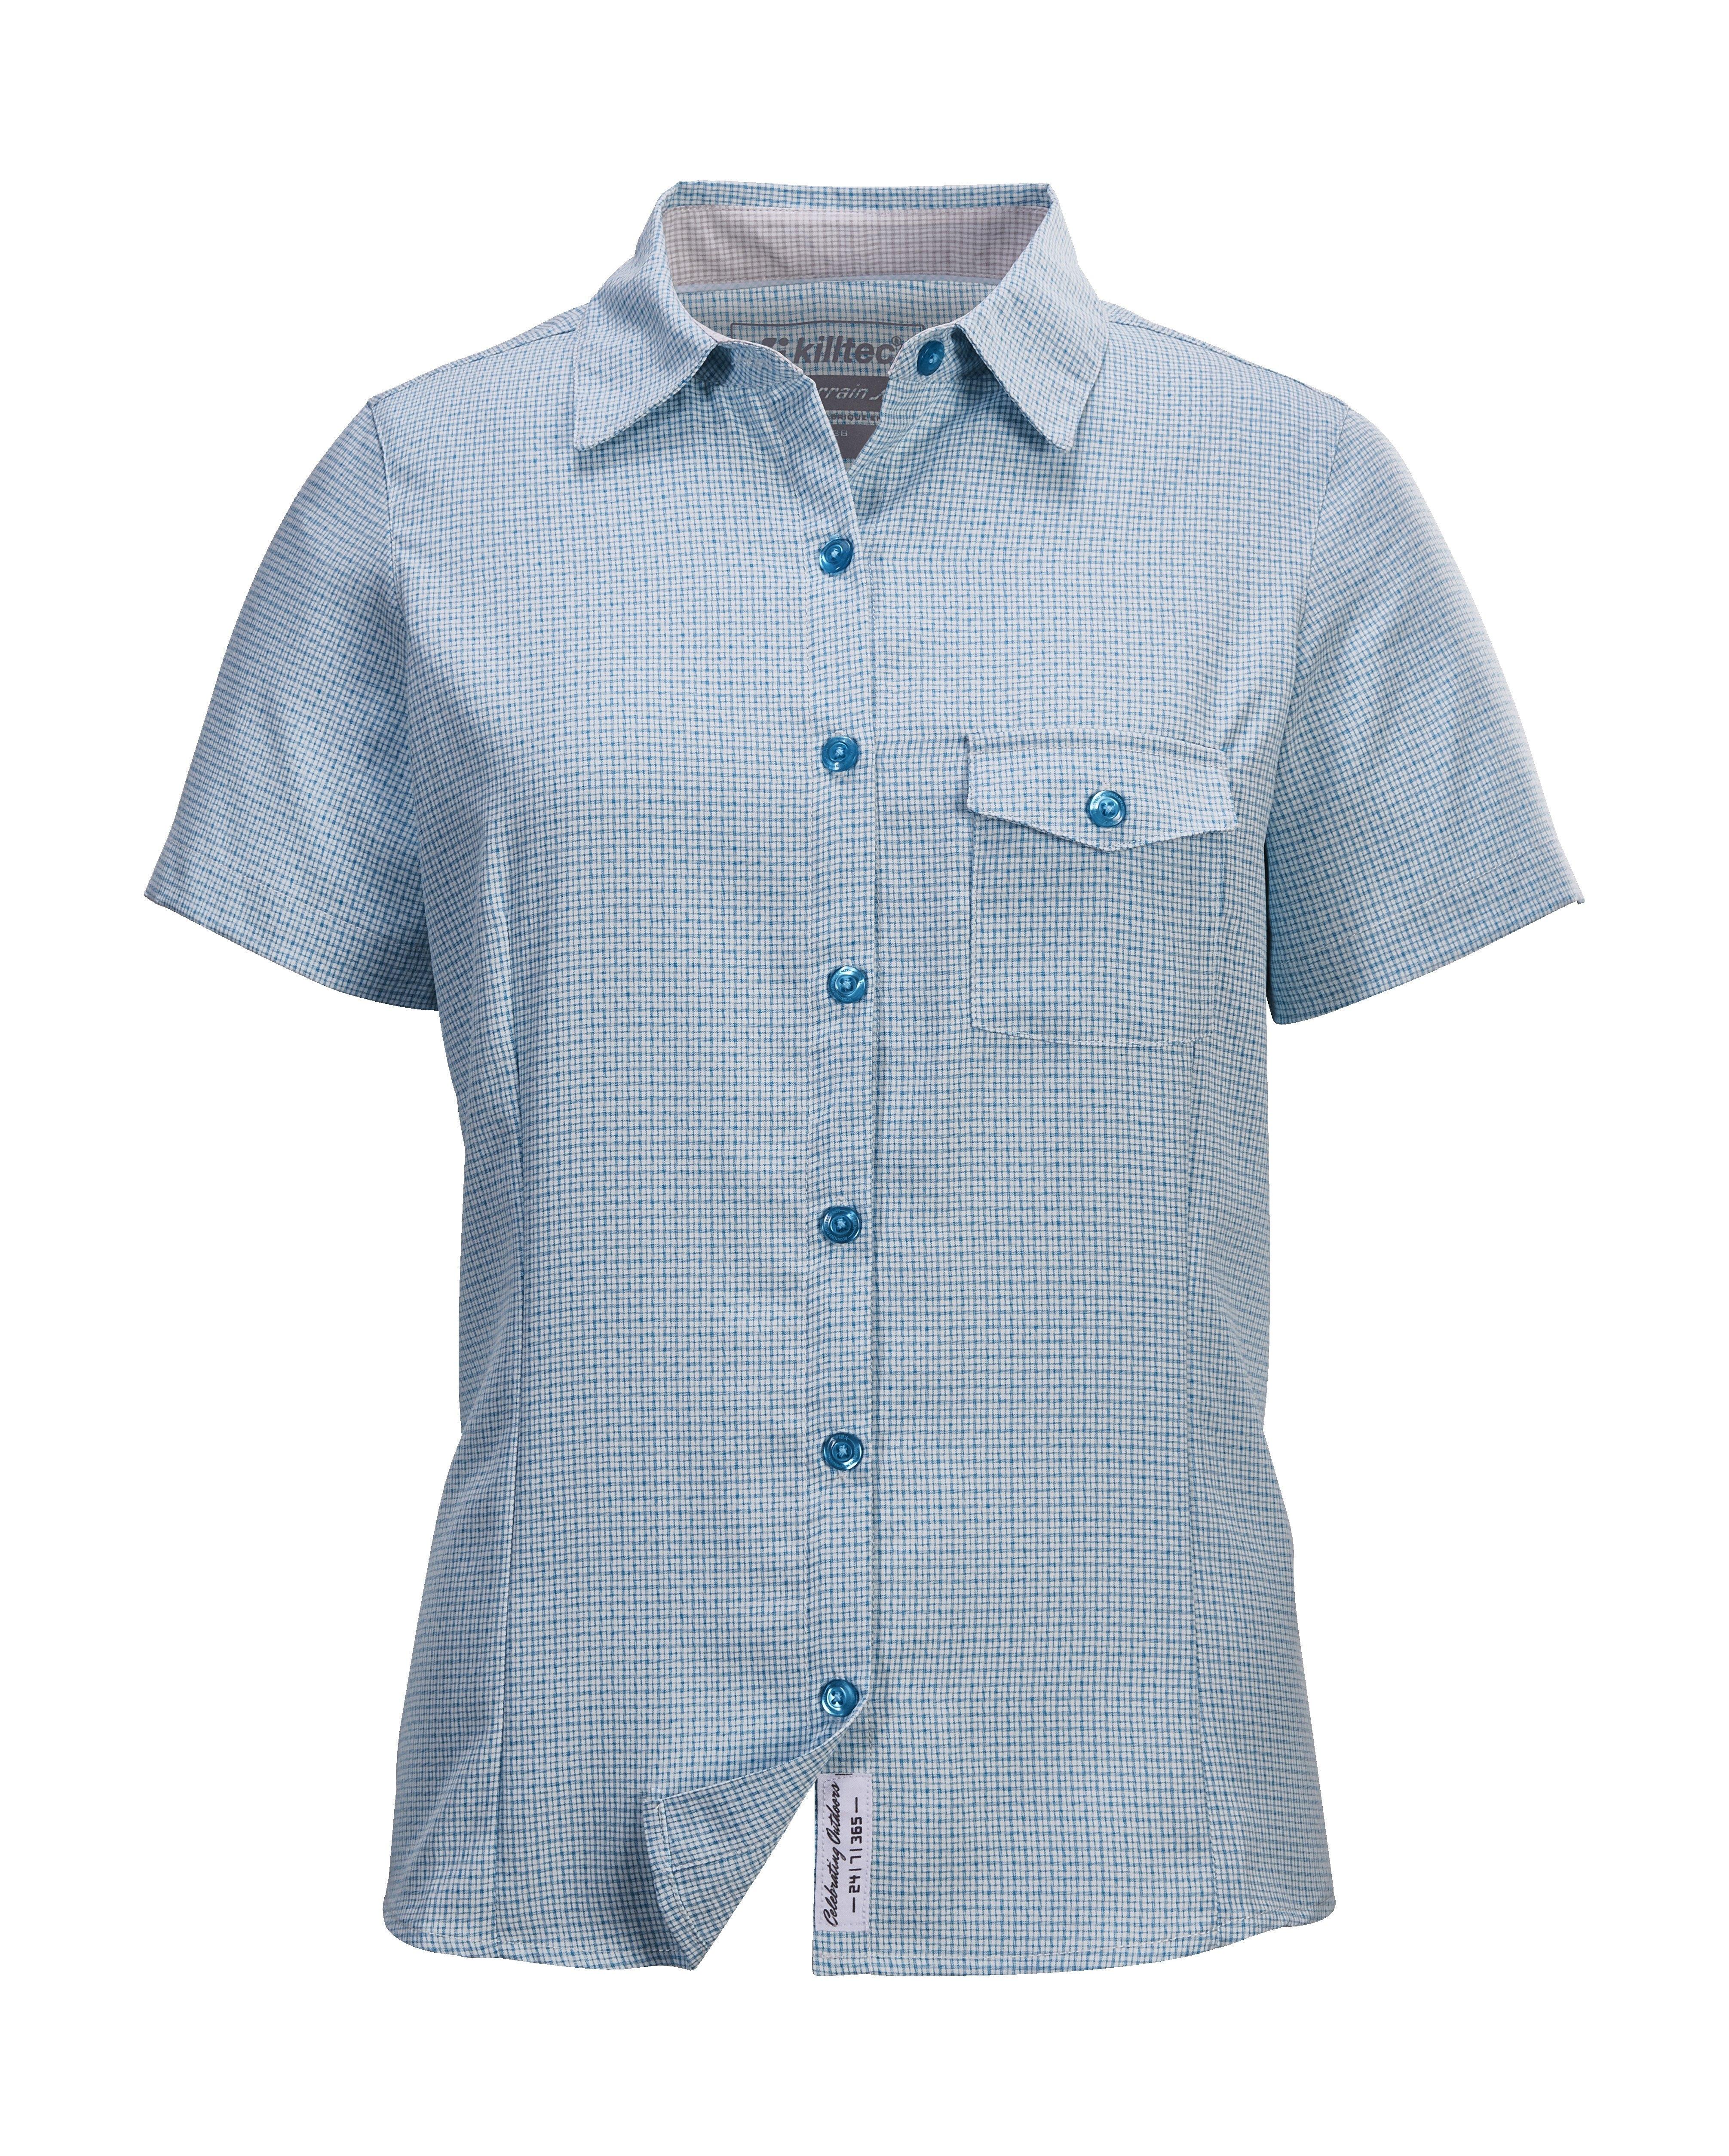 Killtec overhemd met korte mouwen Rodby WMN Woven SHRT D nu online bestellen